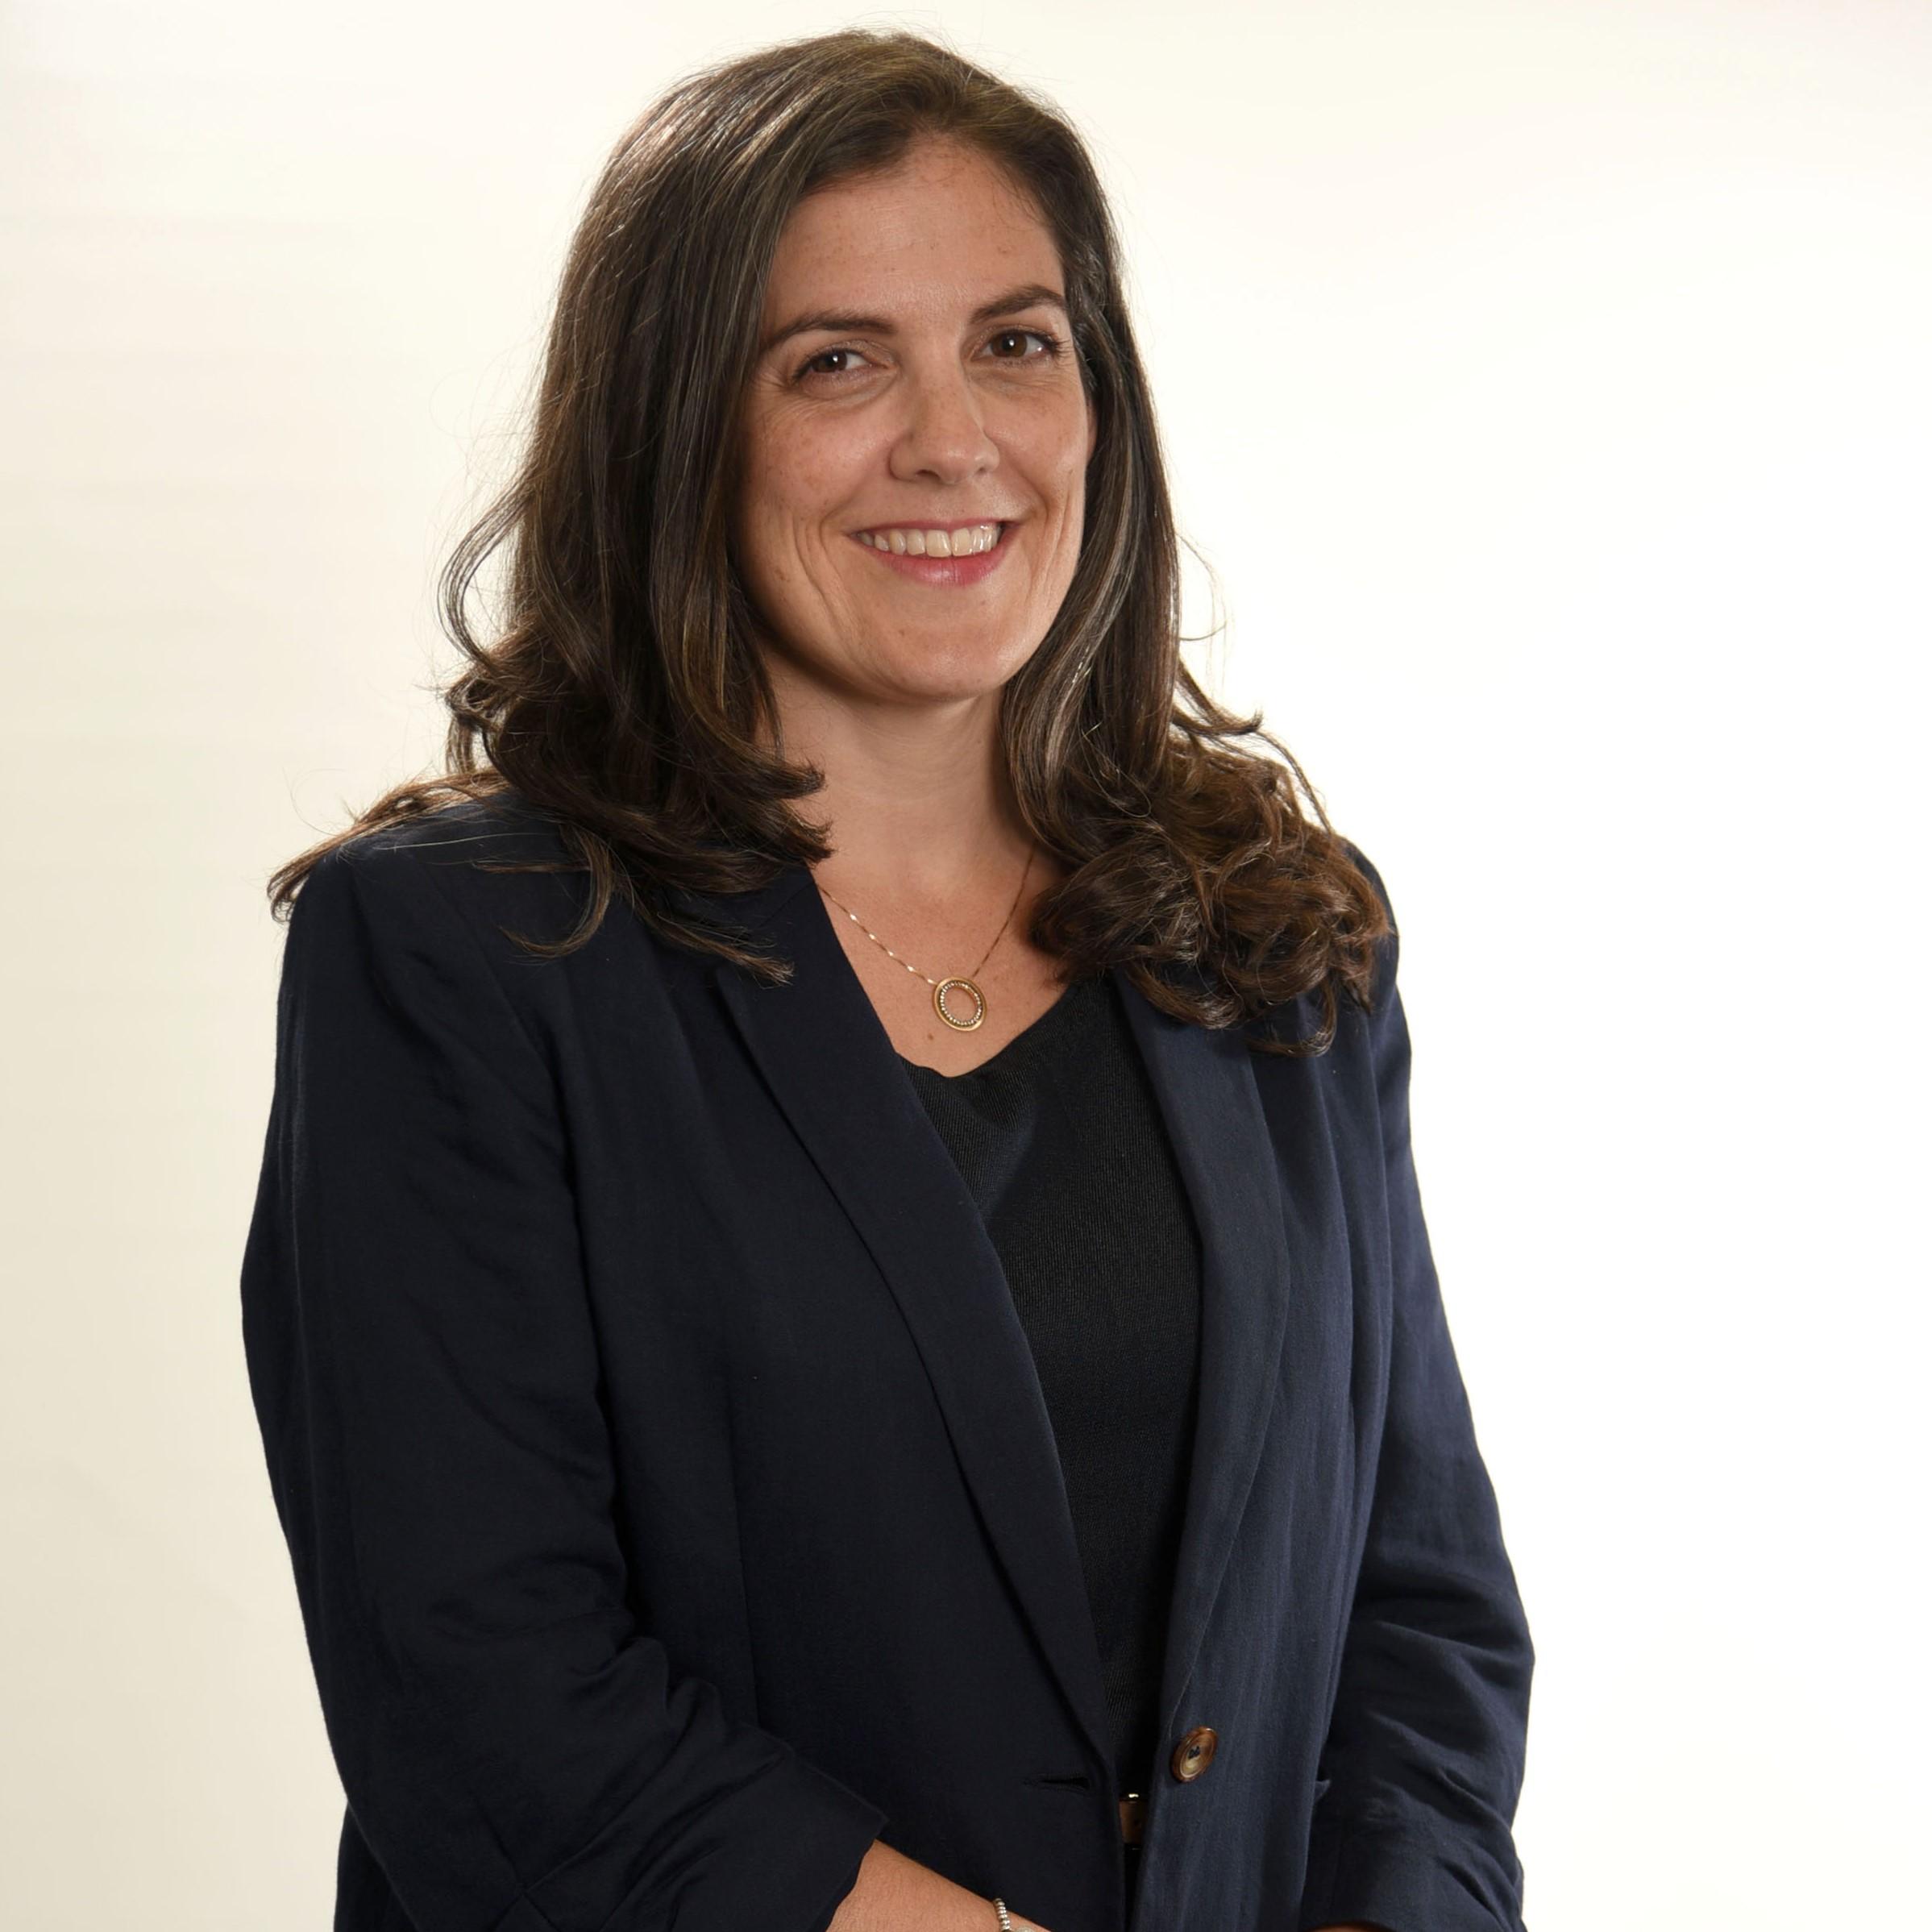 Rachael Ramos